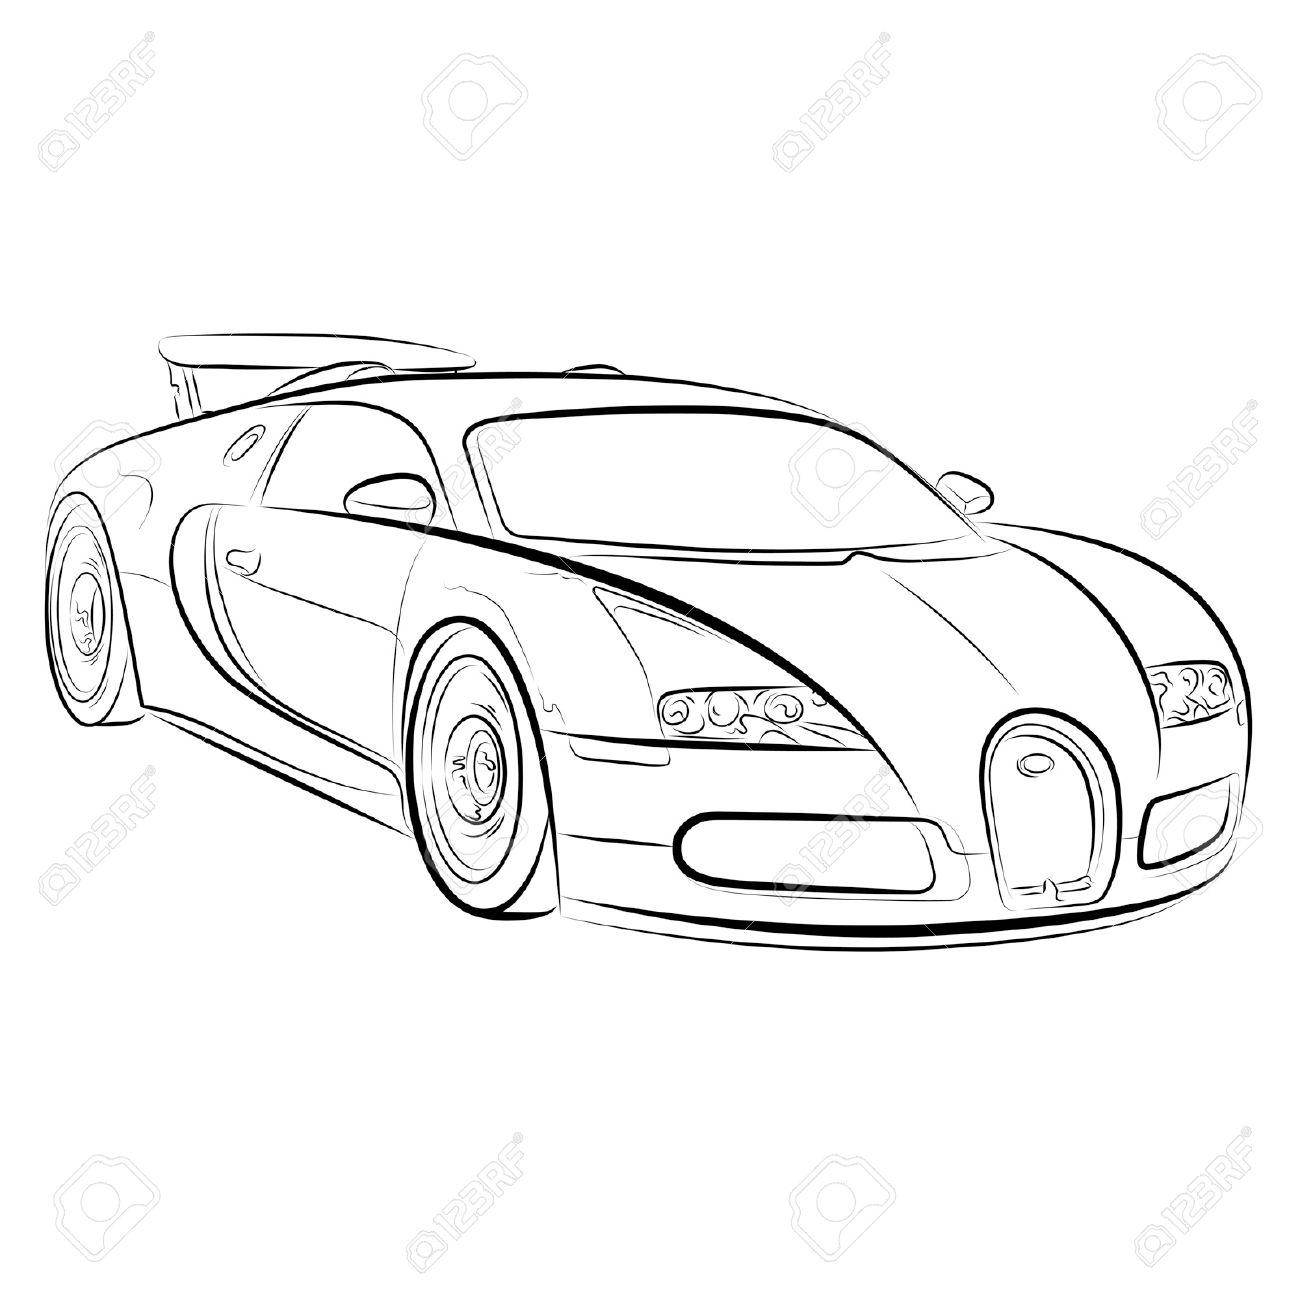 Sport Cars Drawing At Getdrawings